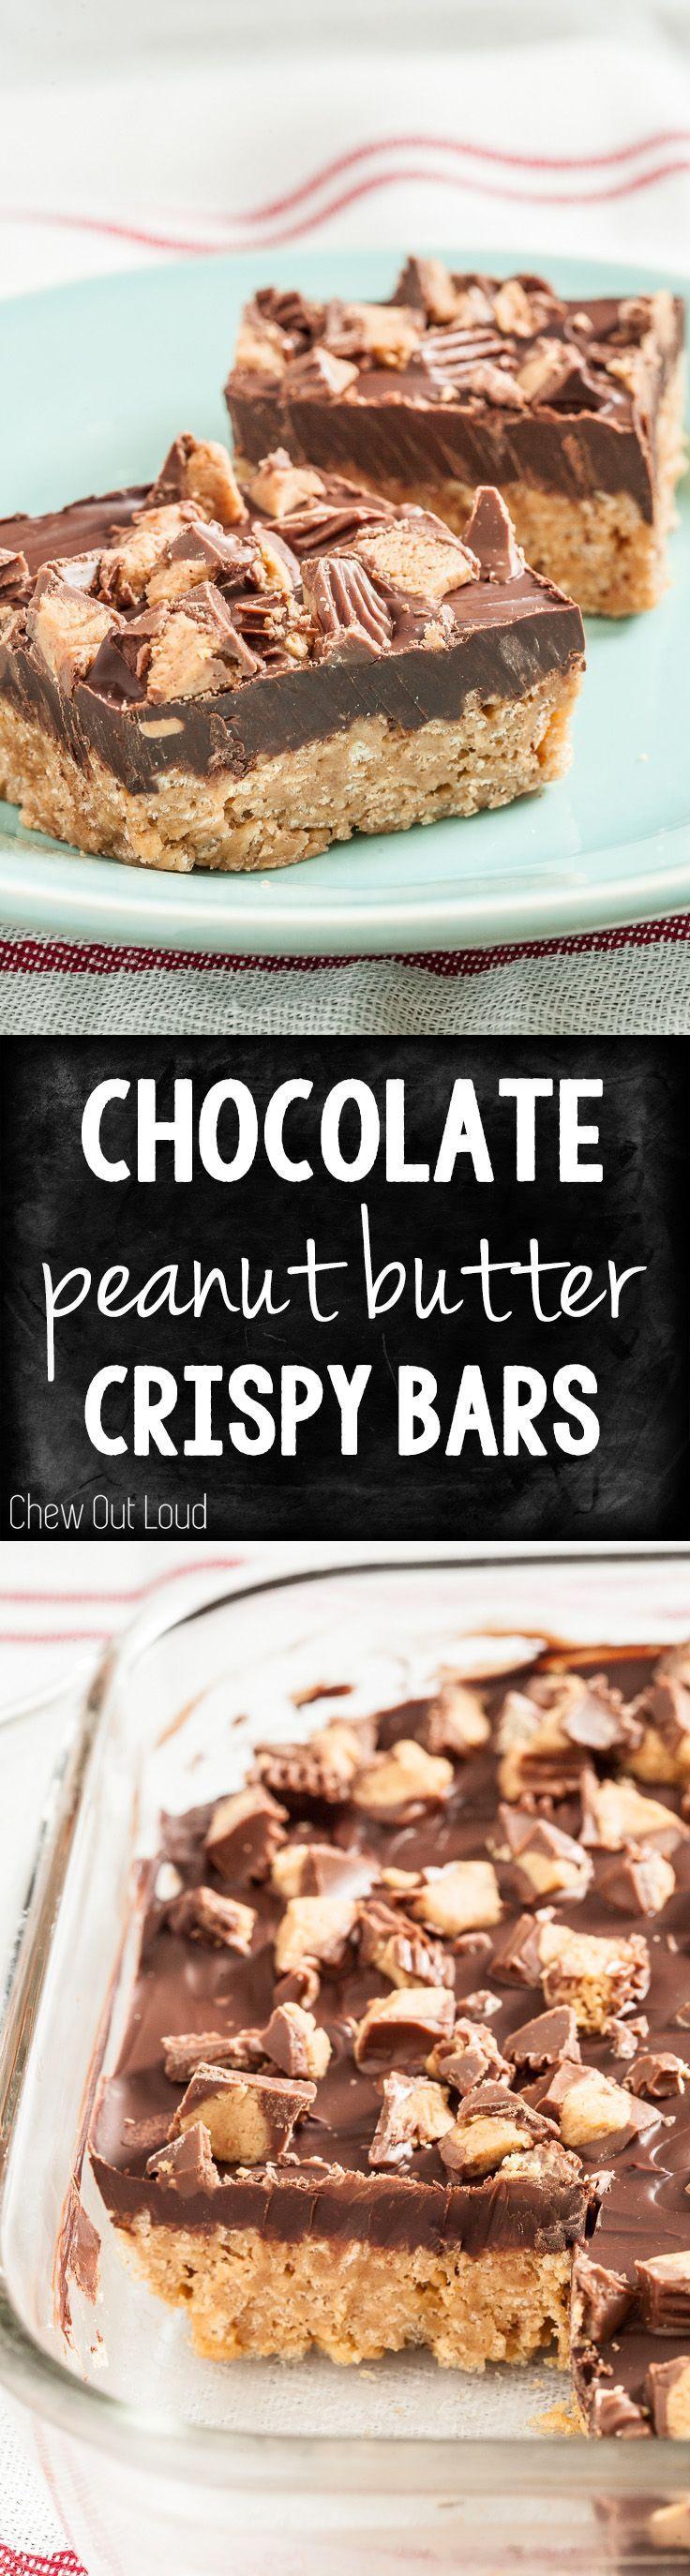 Chocolate Peanut Butter Crispy Bars. Simply irresistible. Easy, make-ahead recipe! #chocolate #peanut butter #dessert